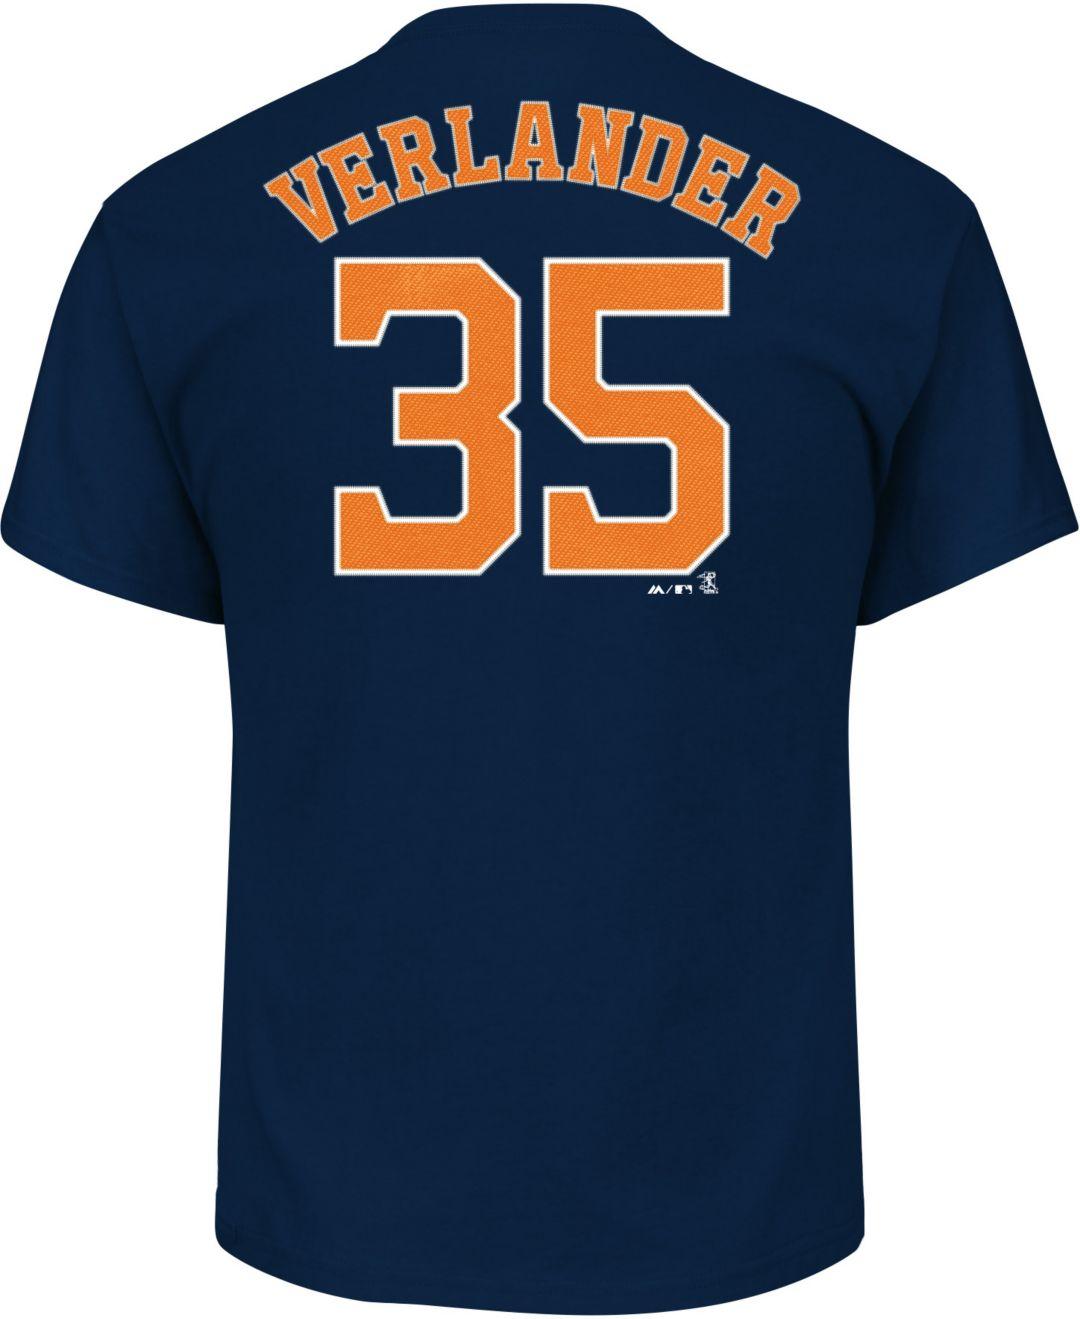 cheaper 850c0 c6c6d Majestic Men's Houston Astros Justin Verlander #35 Navy T-Shirt